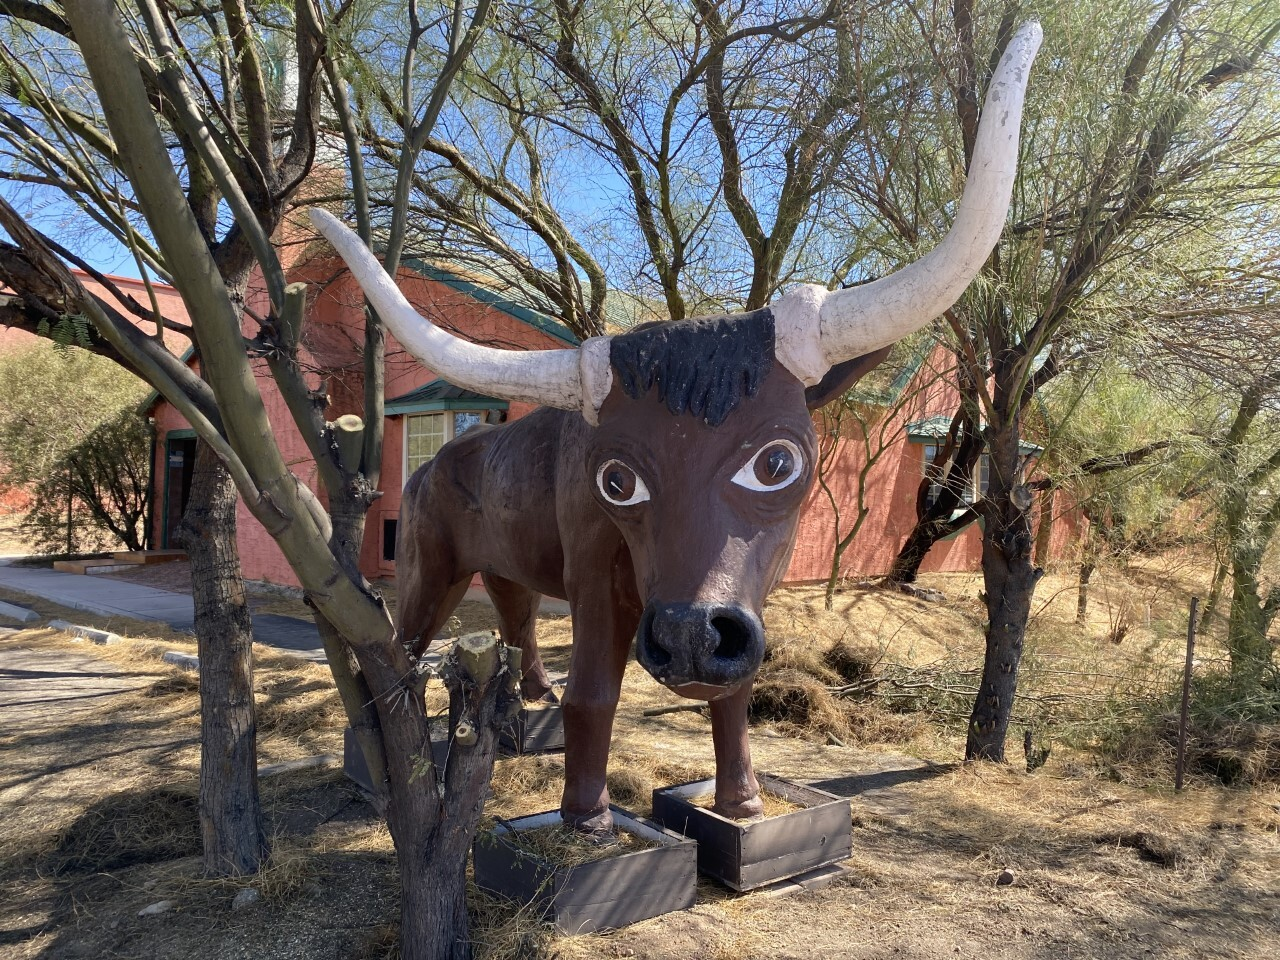 Magic Carpet Golf bull statue